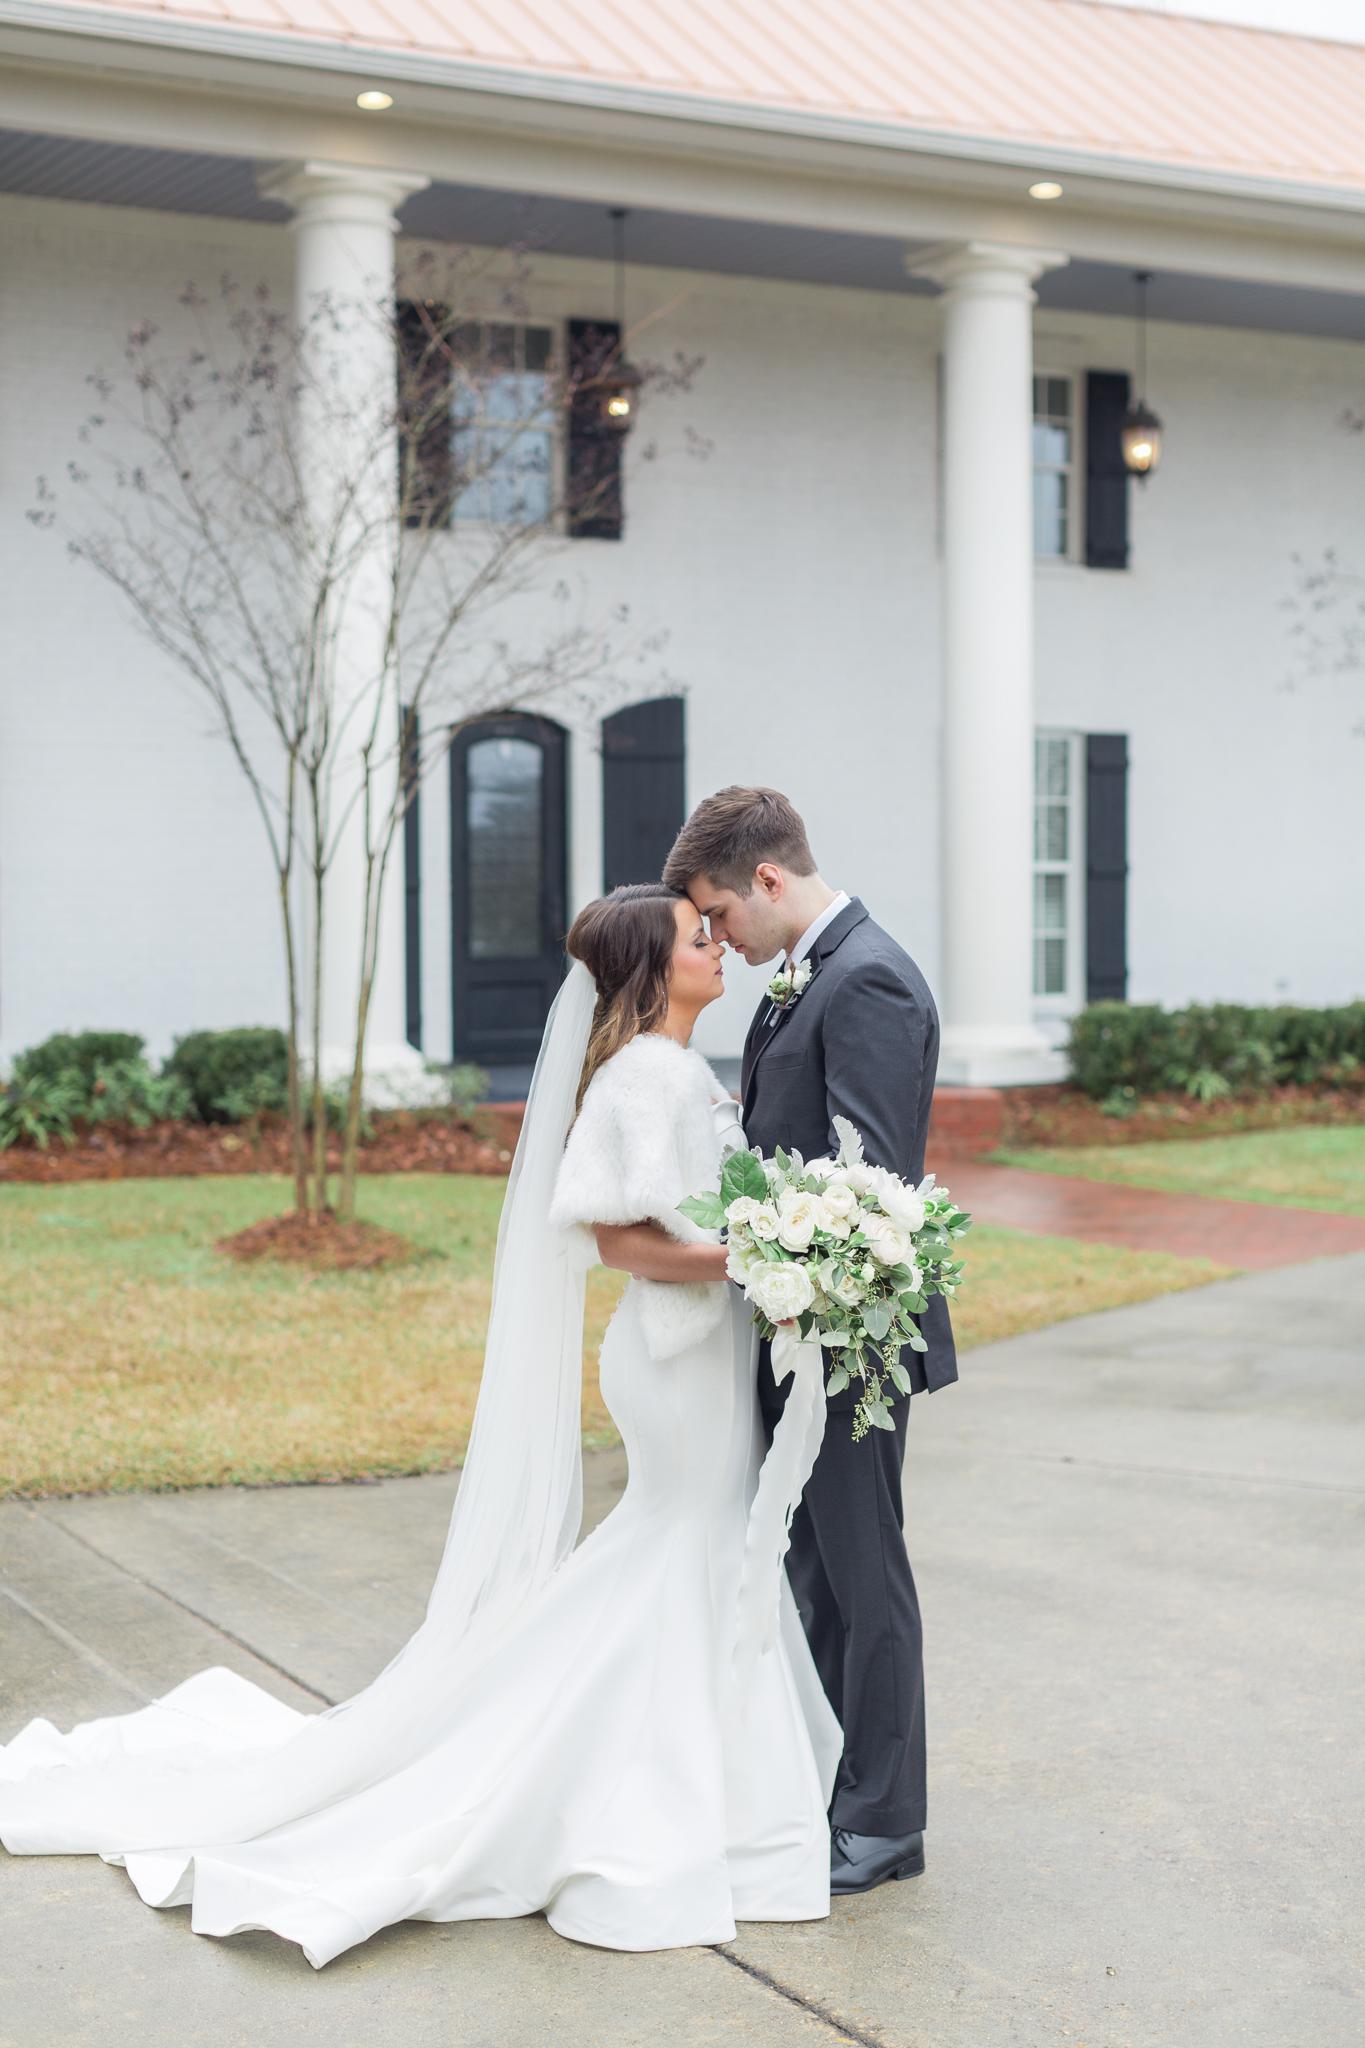 For Brides Weddings: Wedding Venues Flowood Ms At Reisefeber.org